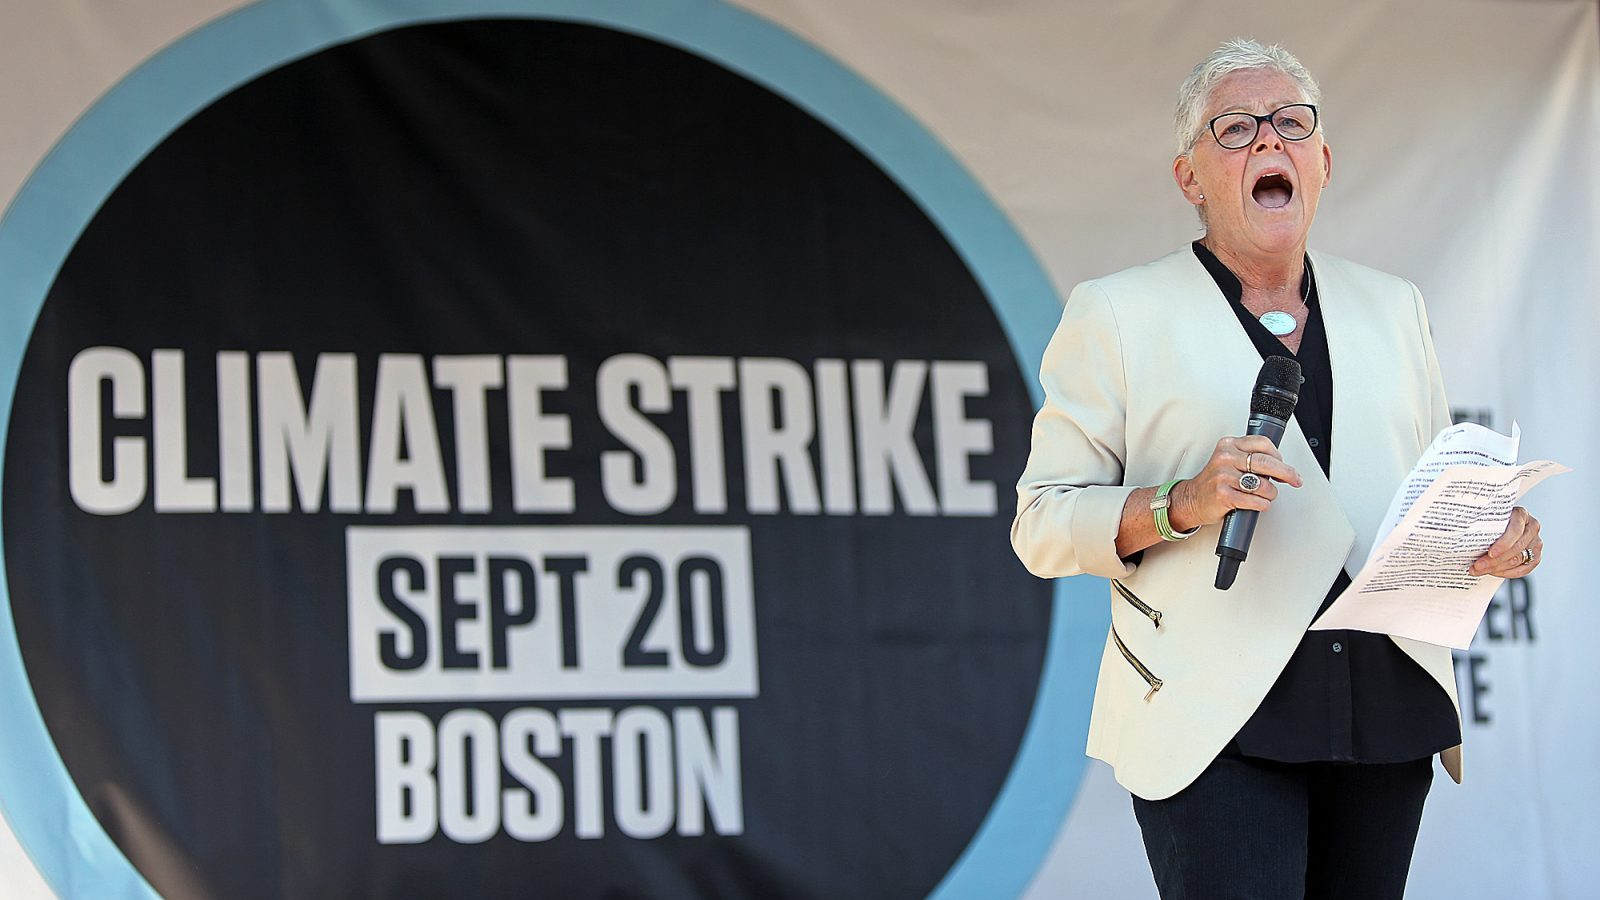 gina mccarthy boston climate strike 2019